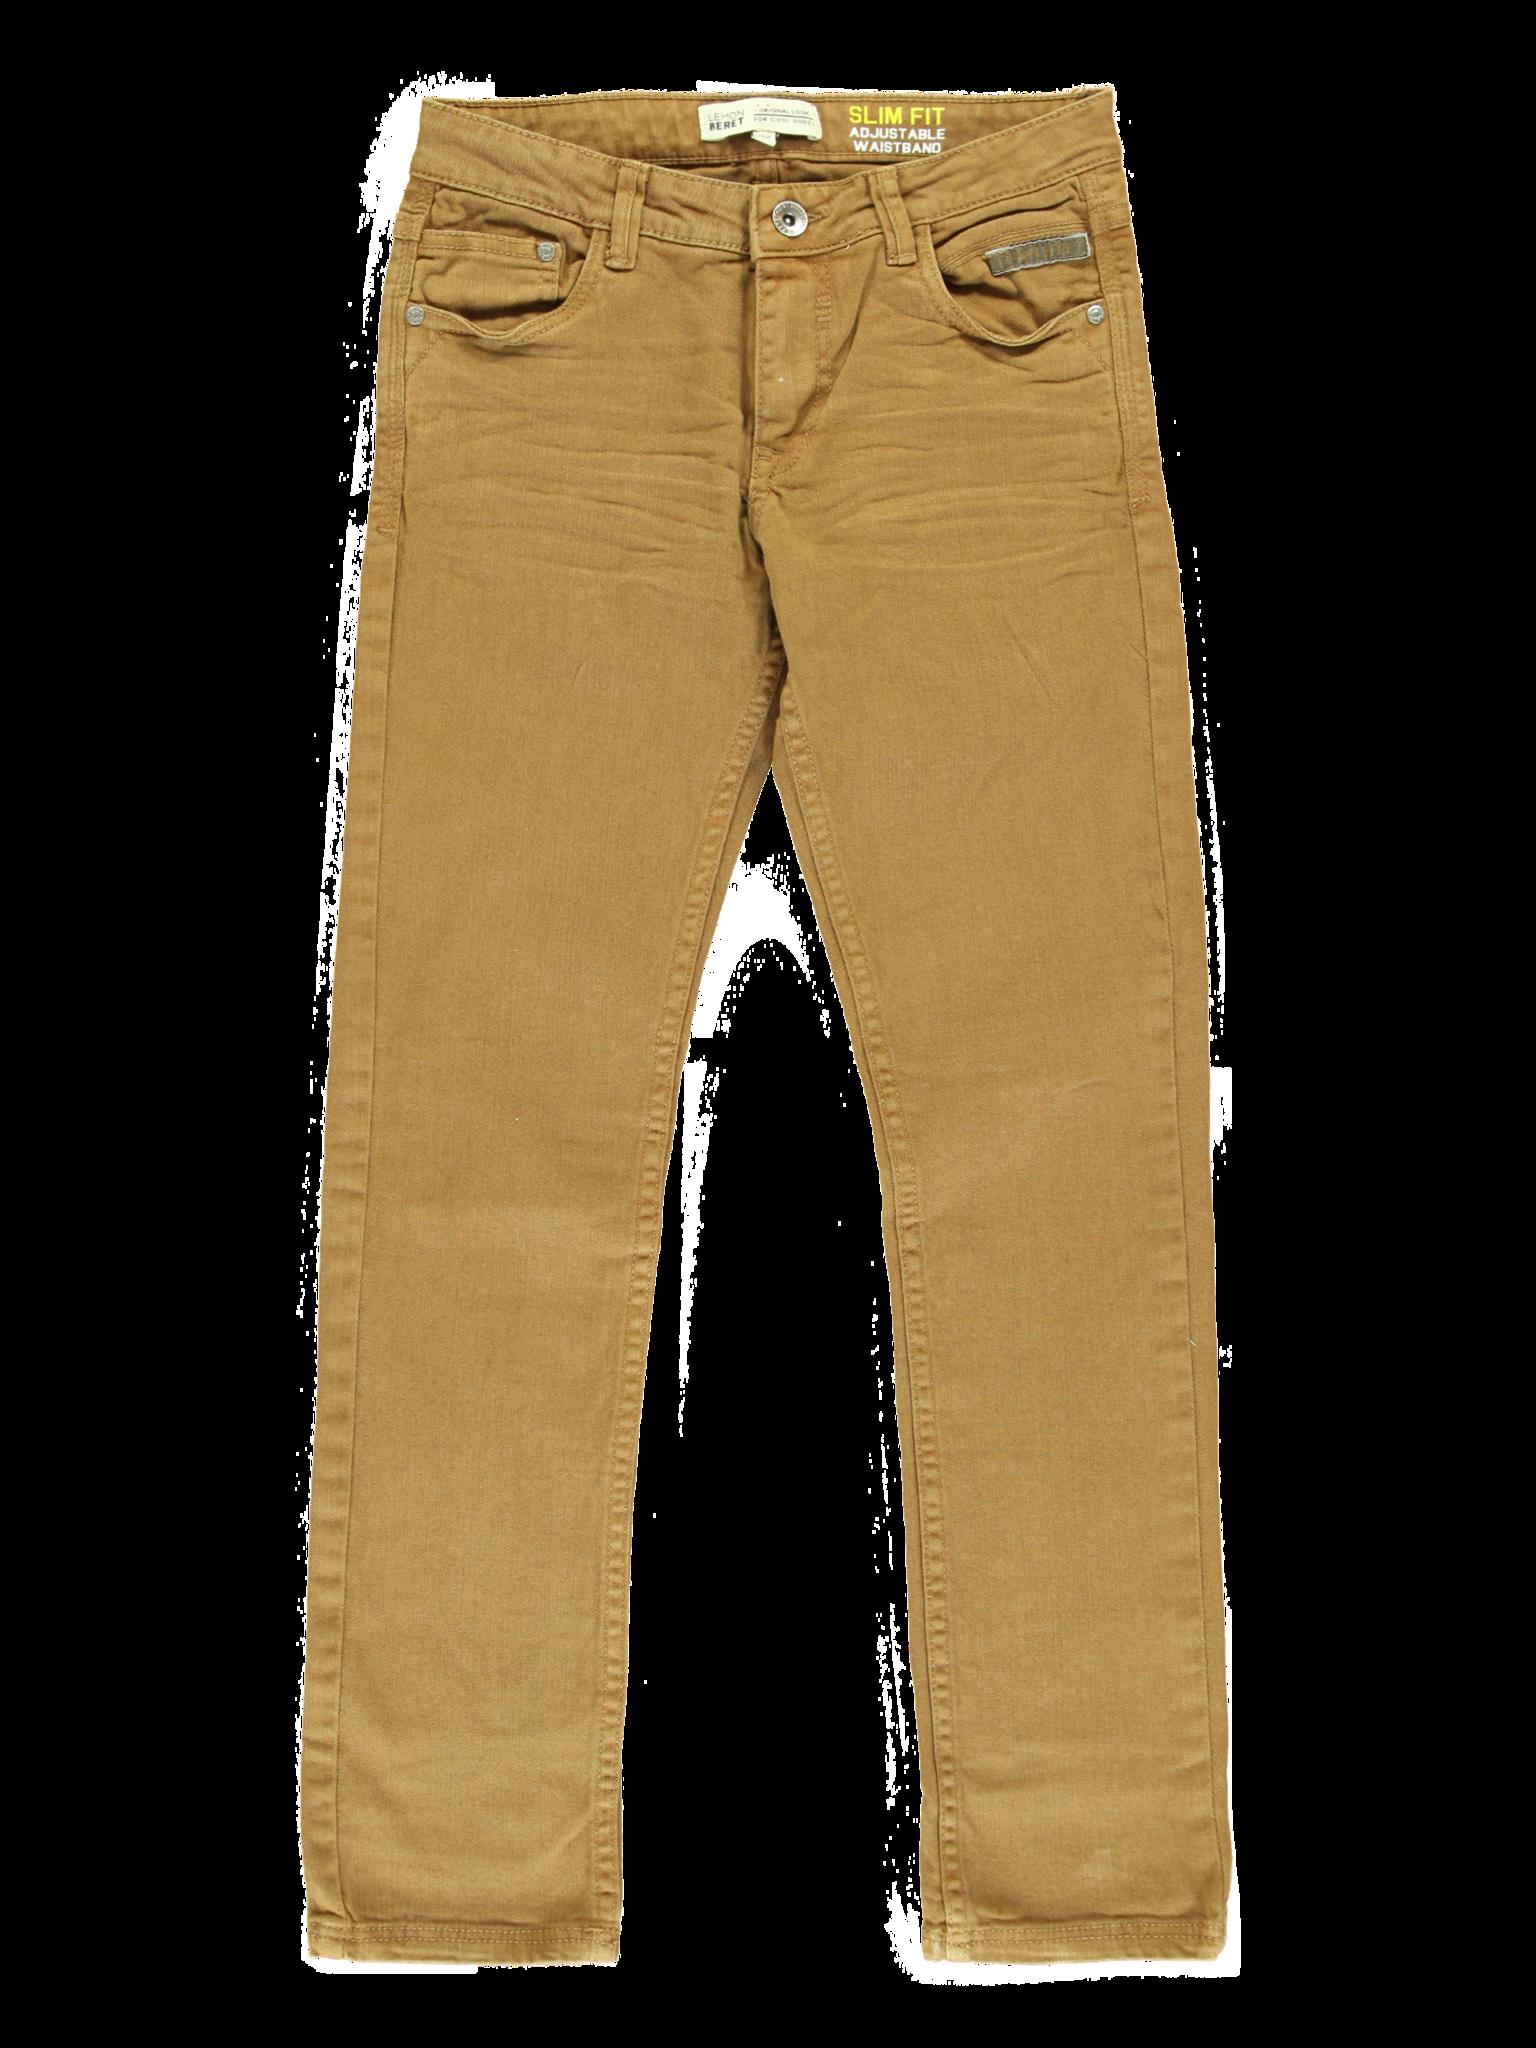 All Brands | Winterproducts Teen Boys | Pants | 10 pcs/box